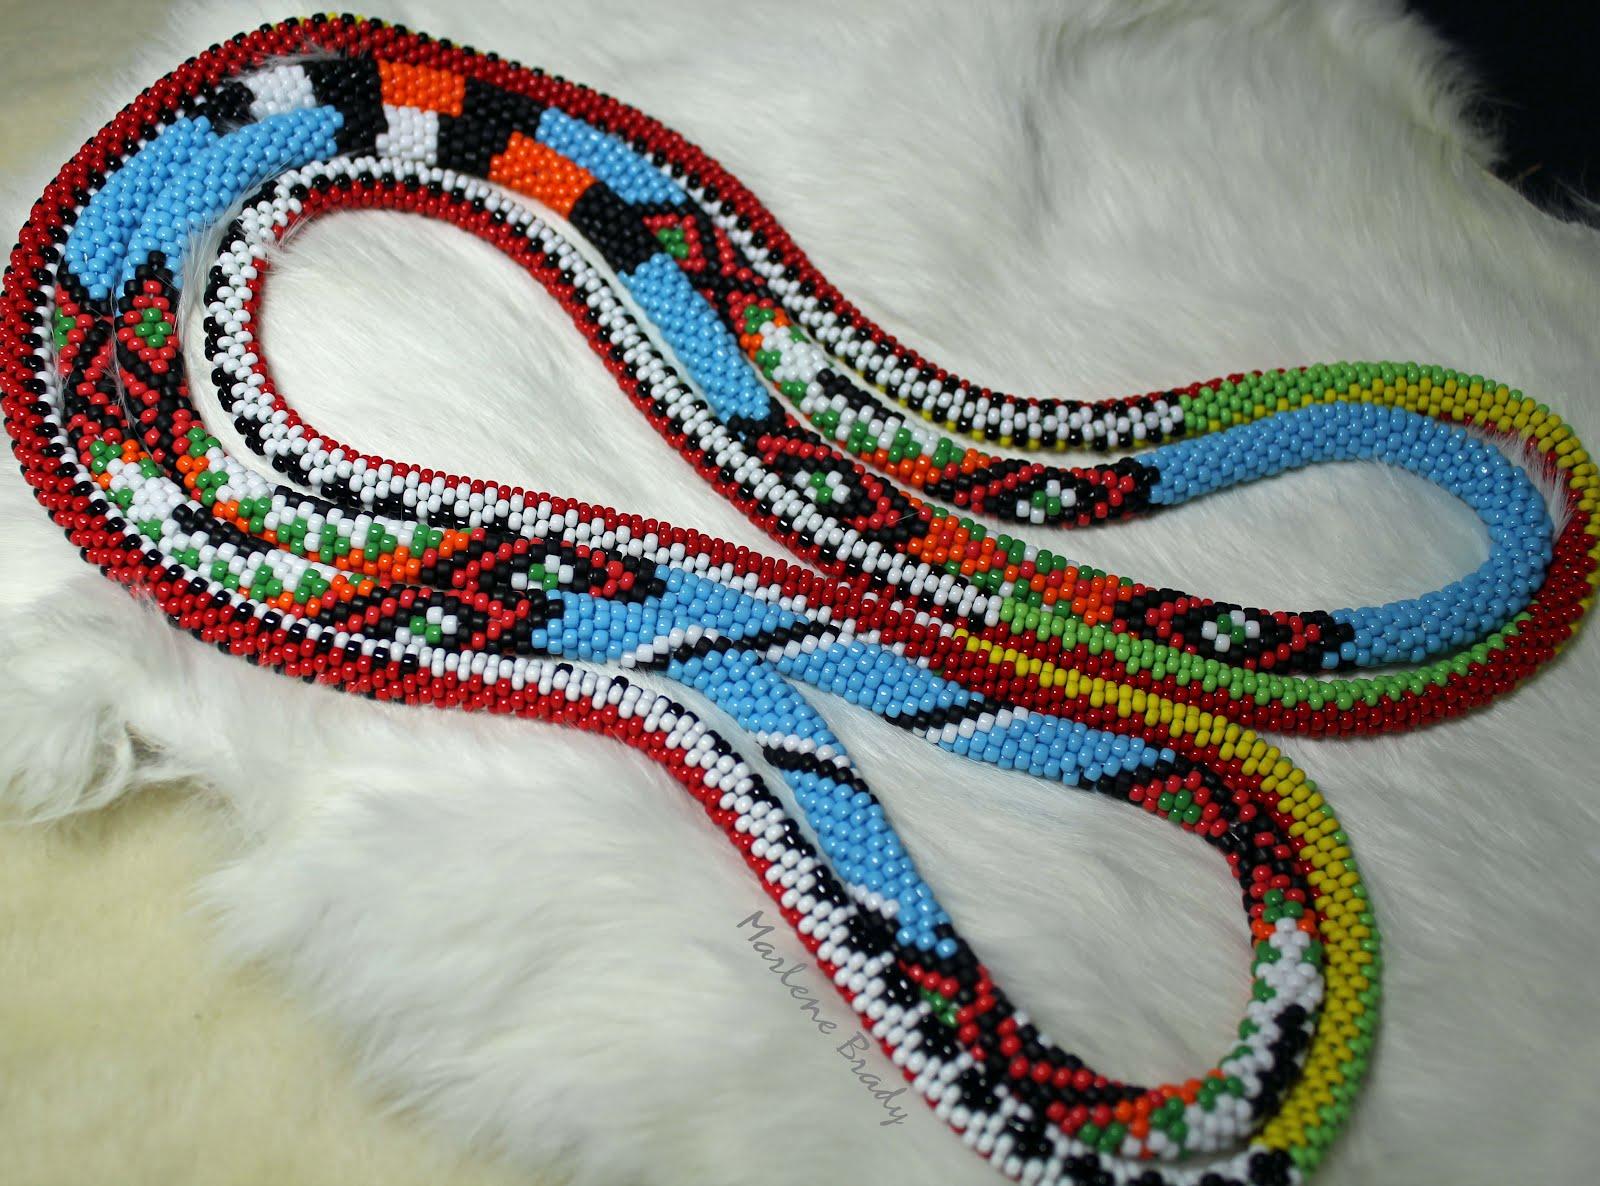 Free Native American Beadwork Patterns 14 Background Wallpaper